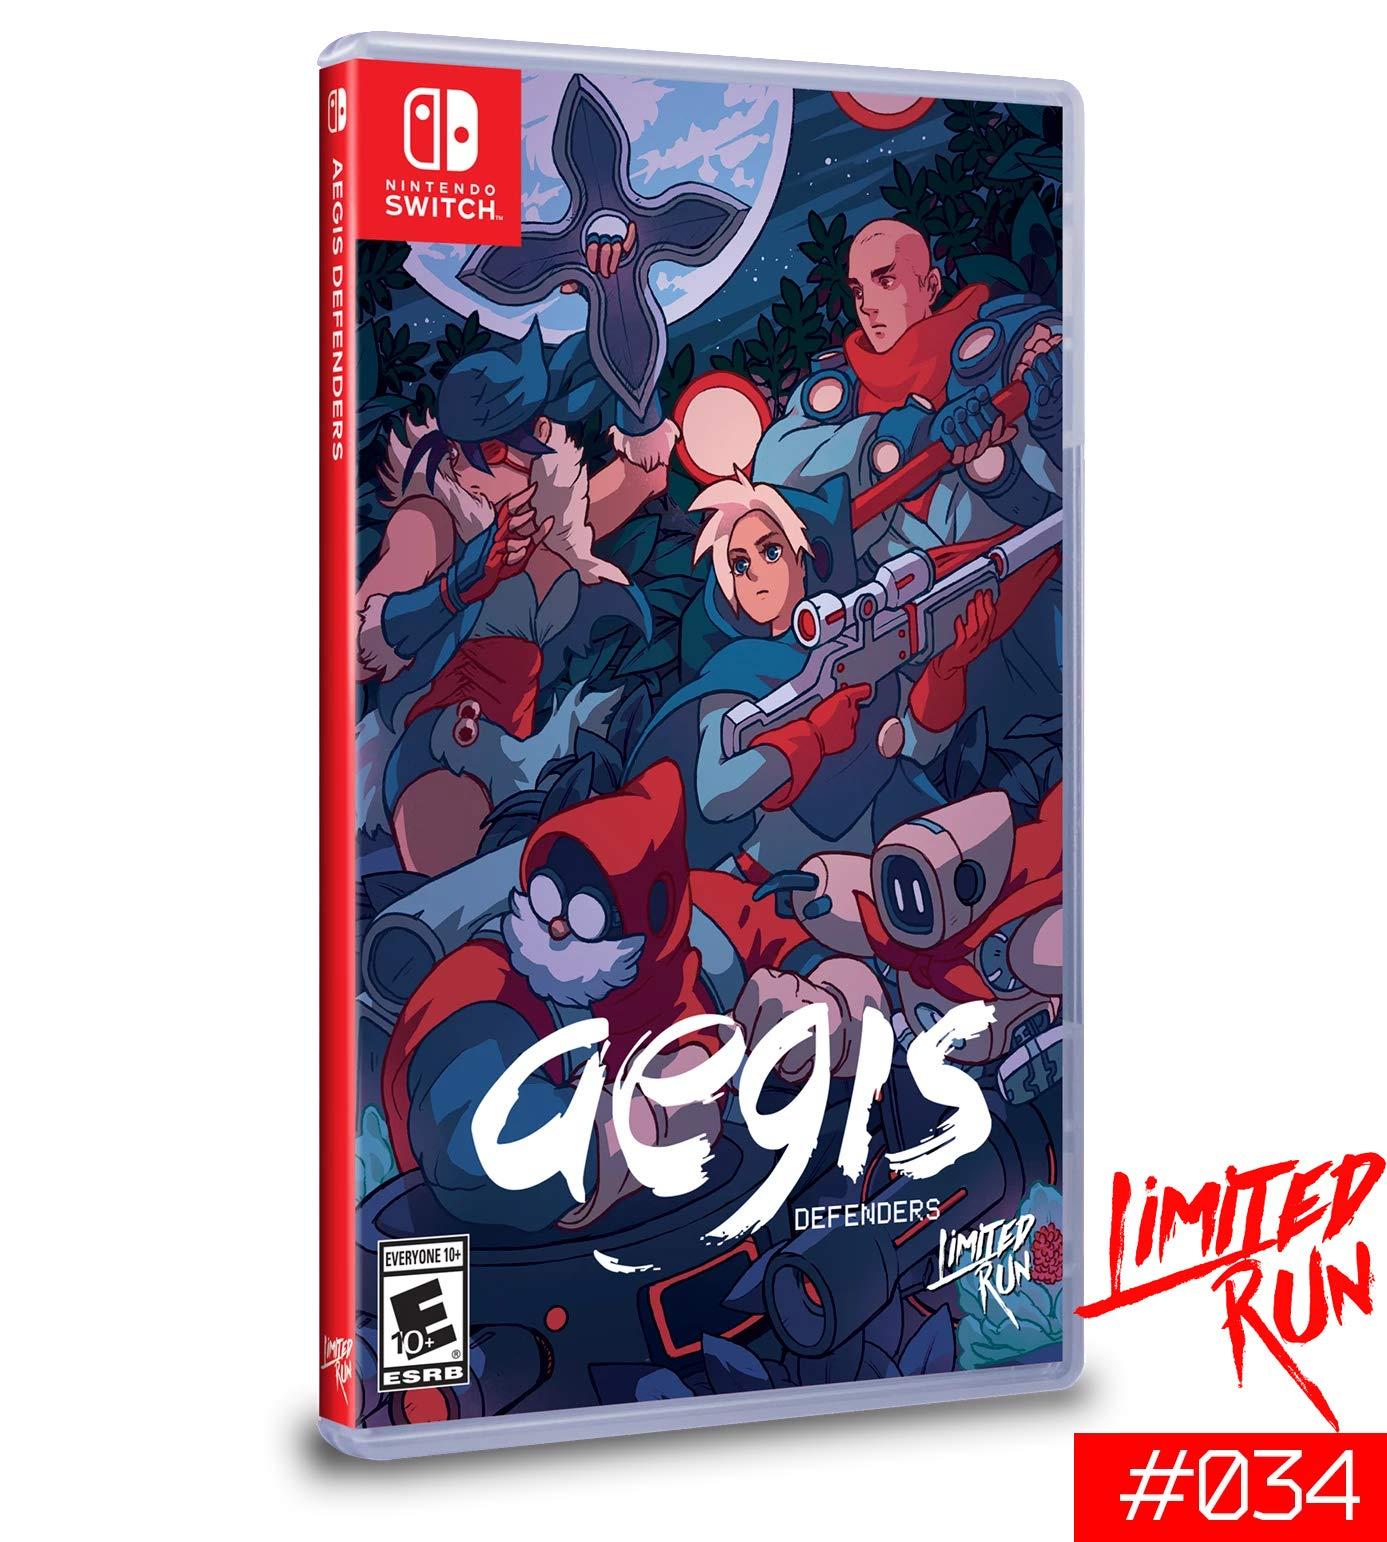 Amazon.com: Aegis Defenders -- Limited Run #34: Video Games